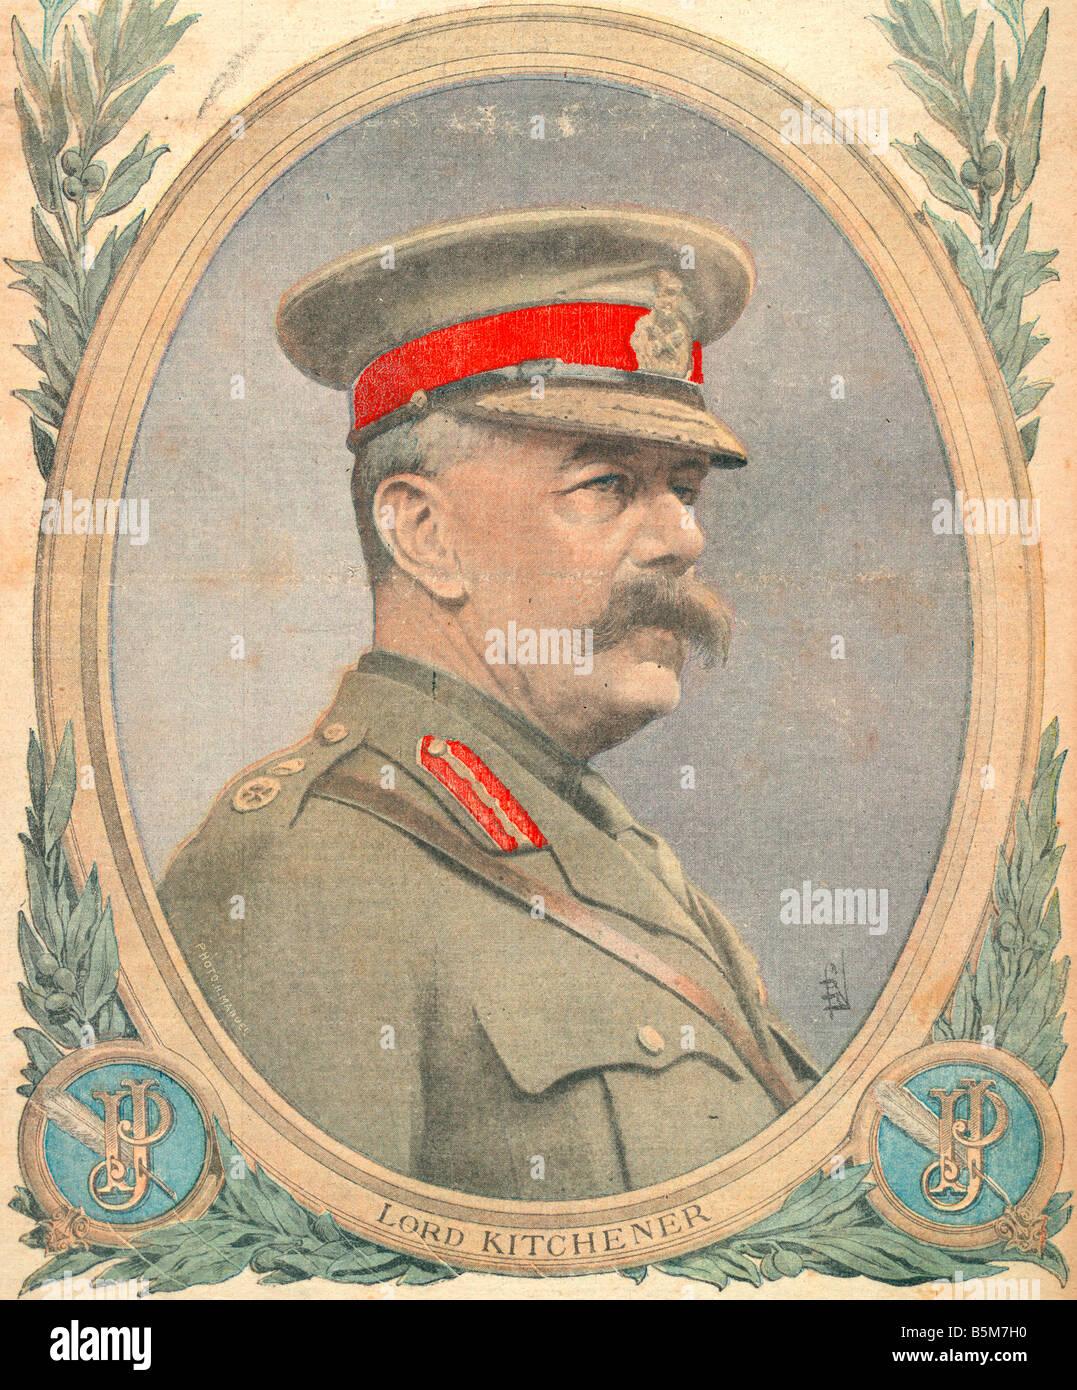 1EN 259 C1916 E Lord Kitchener From Petit Journal Kitchener Herbert Earl K of Khartoum Brit military since 1909 Stock Photo